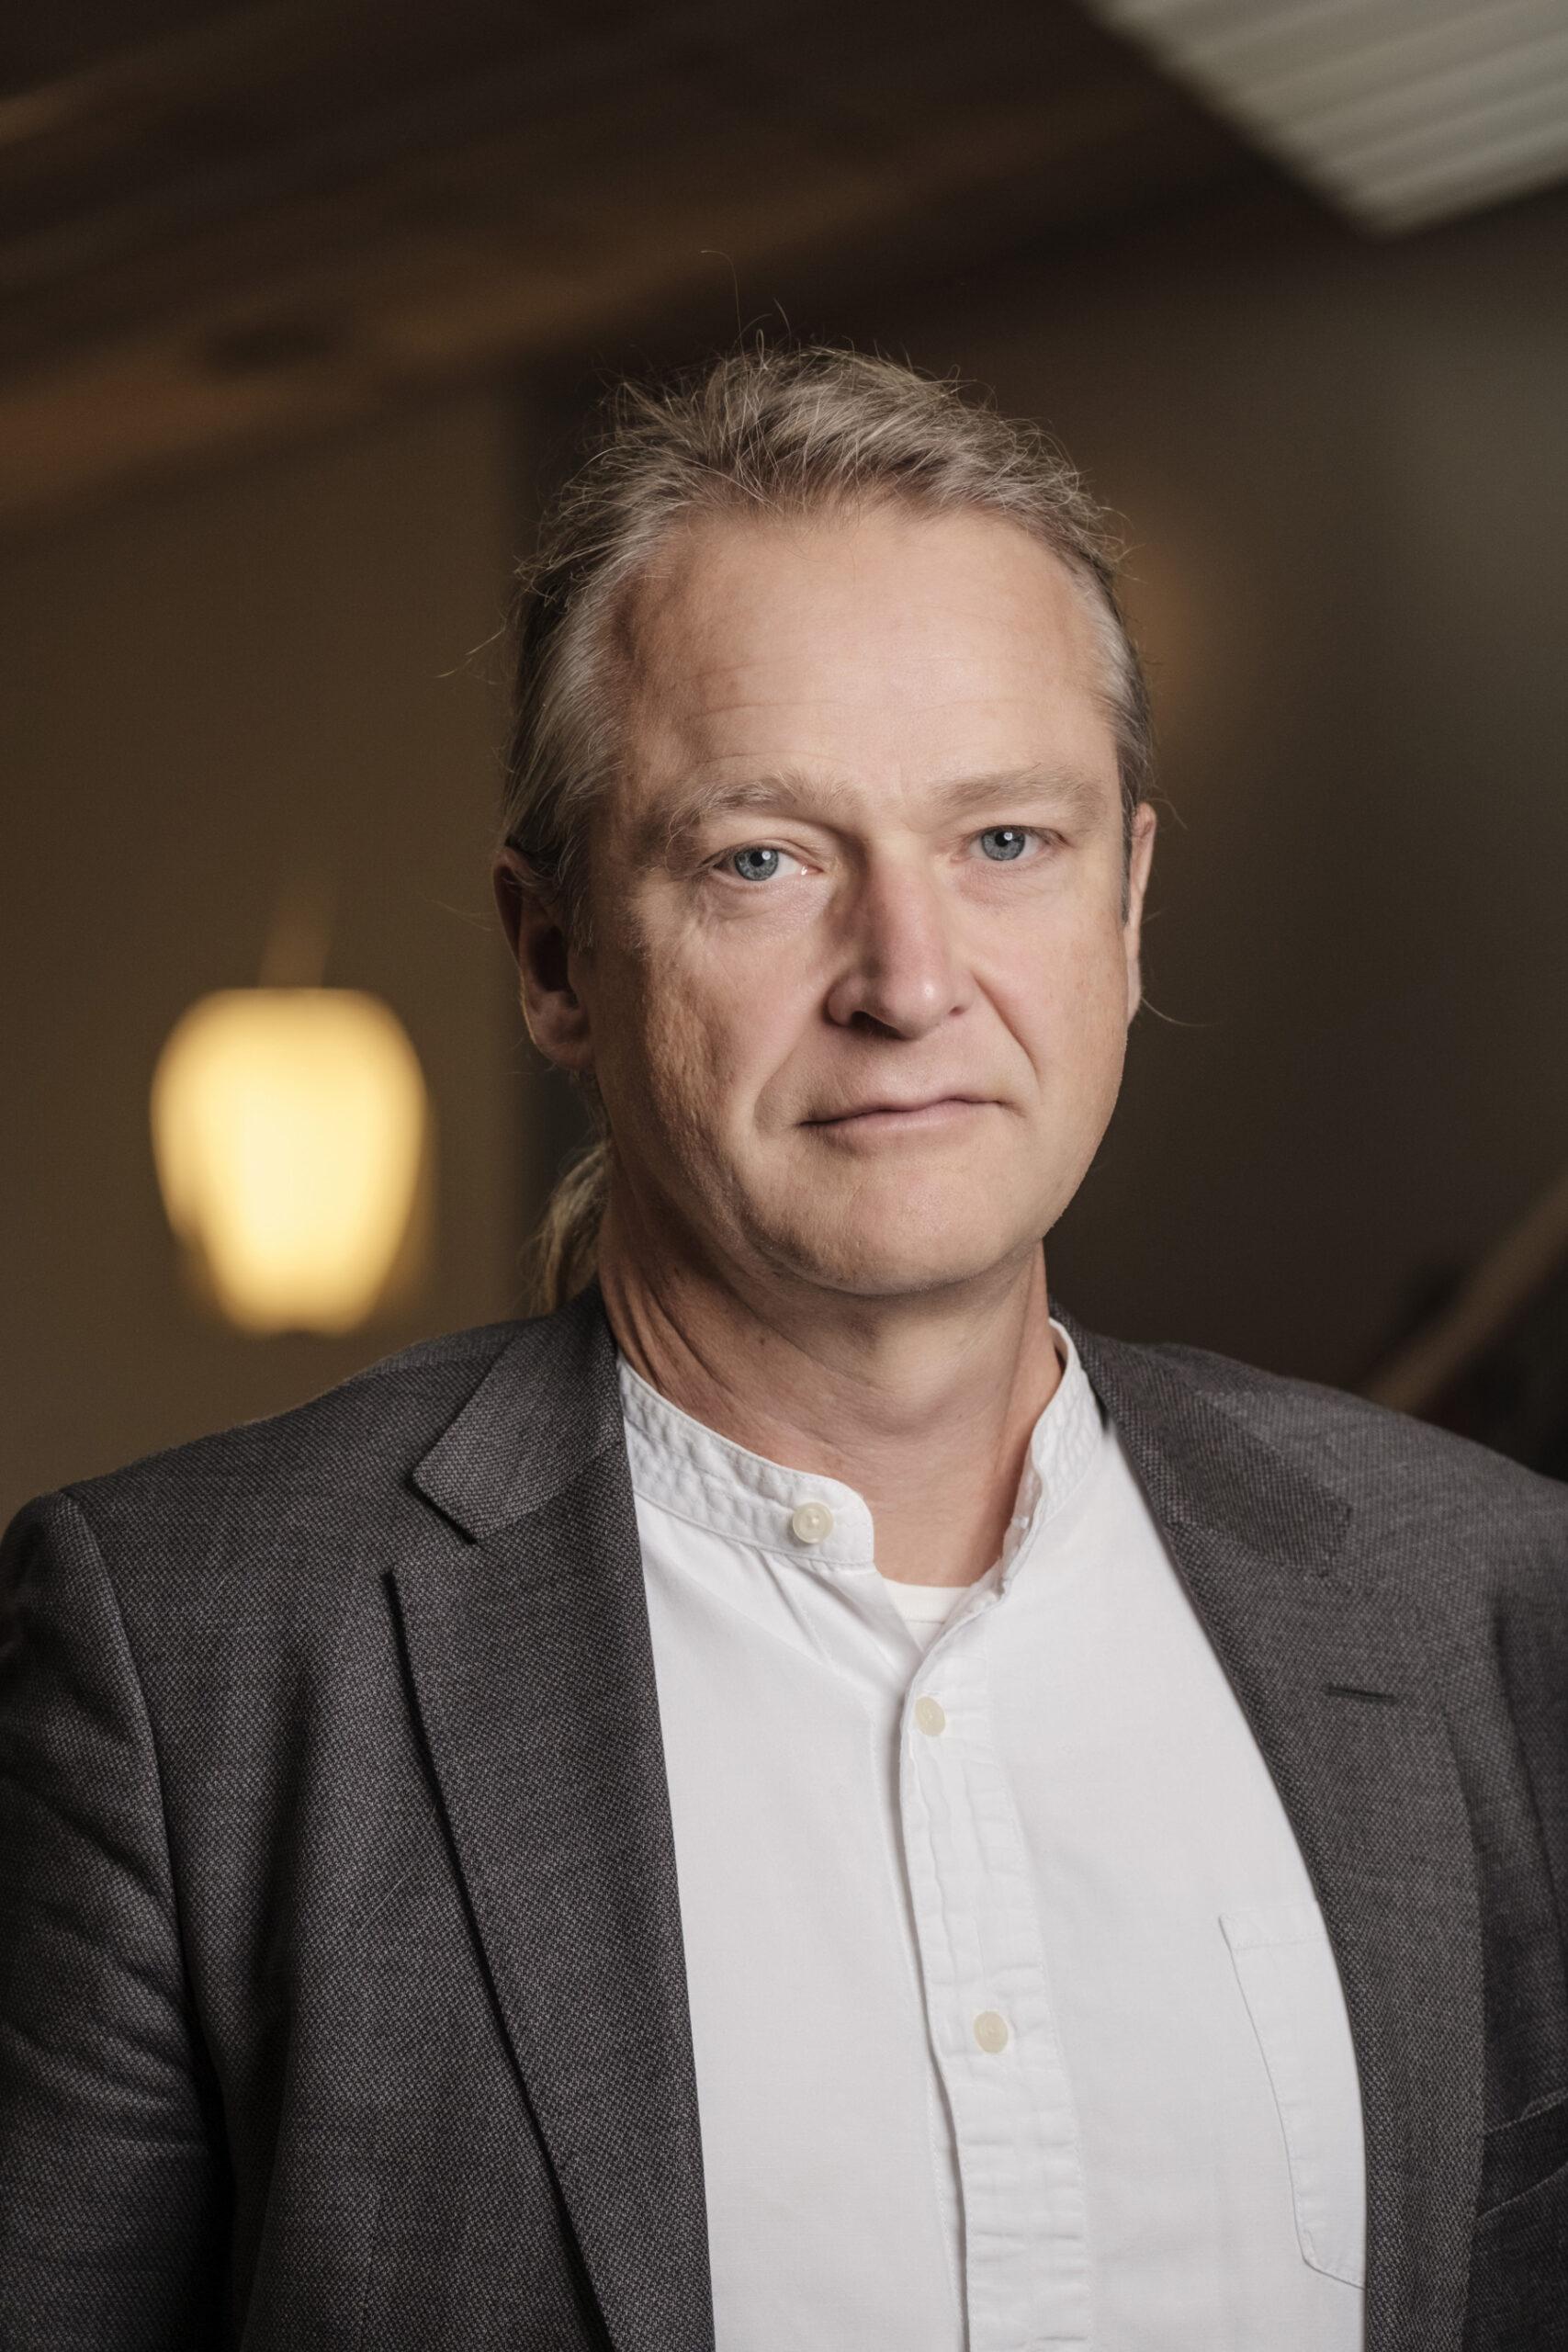 Magnus Jiborn